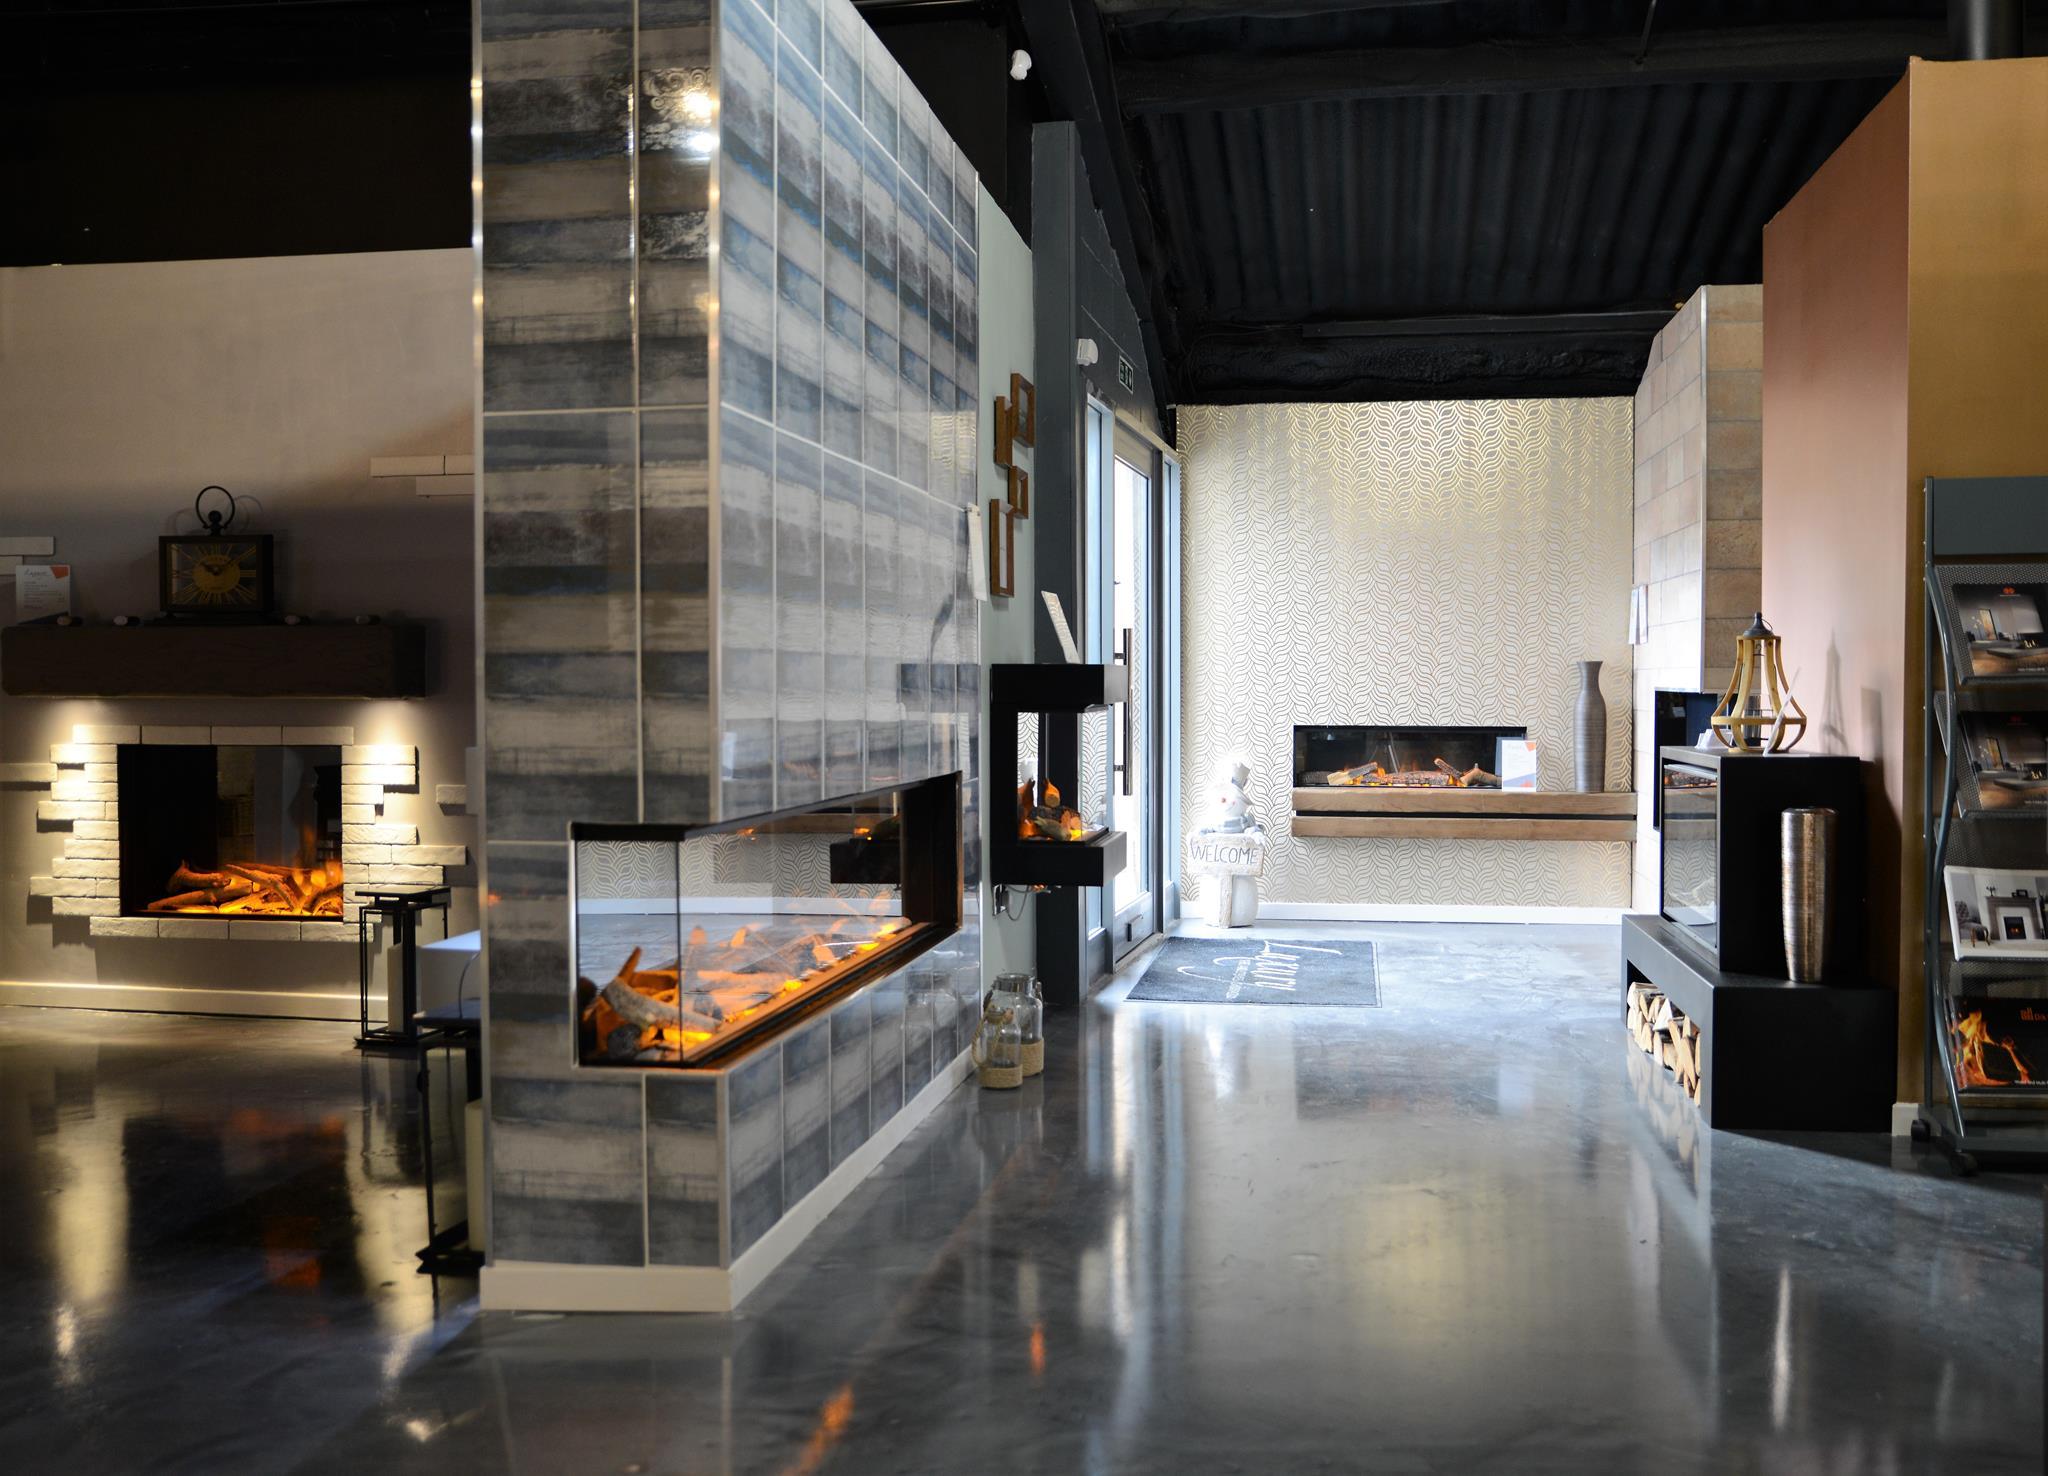 Fireplace warehouse Lancashire enterance